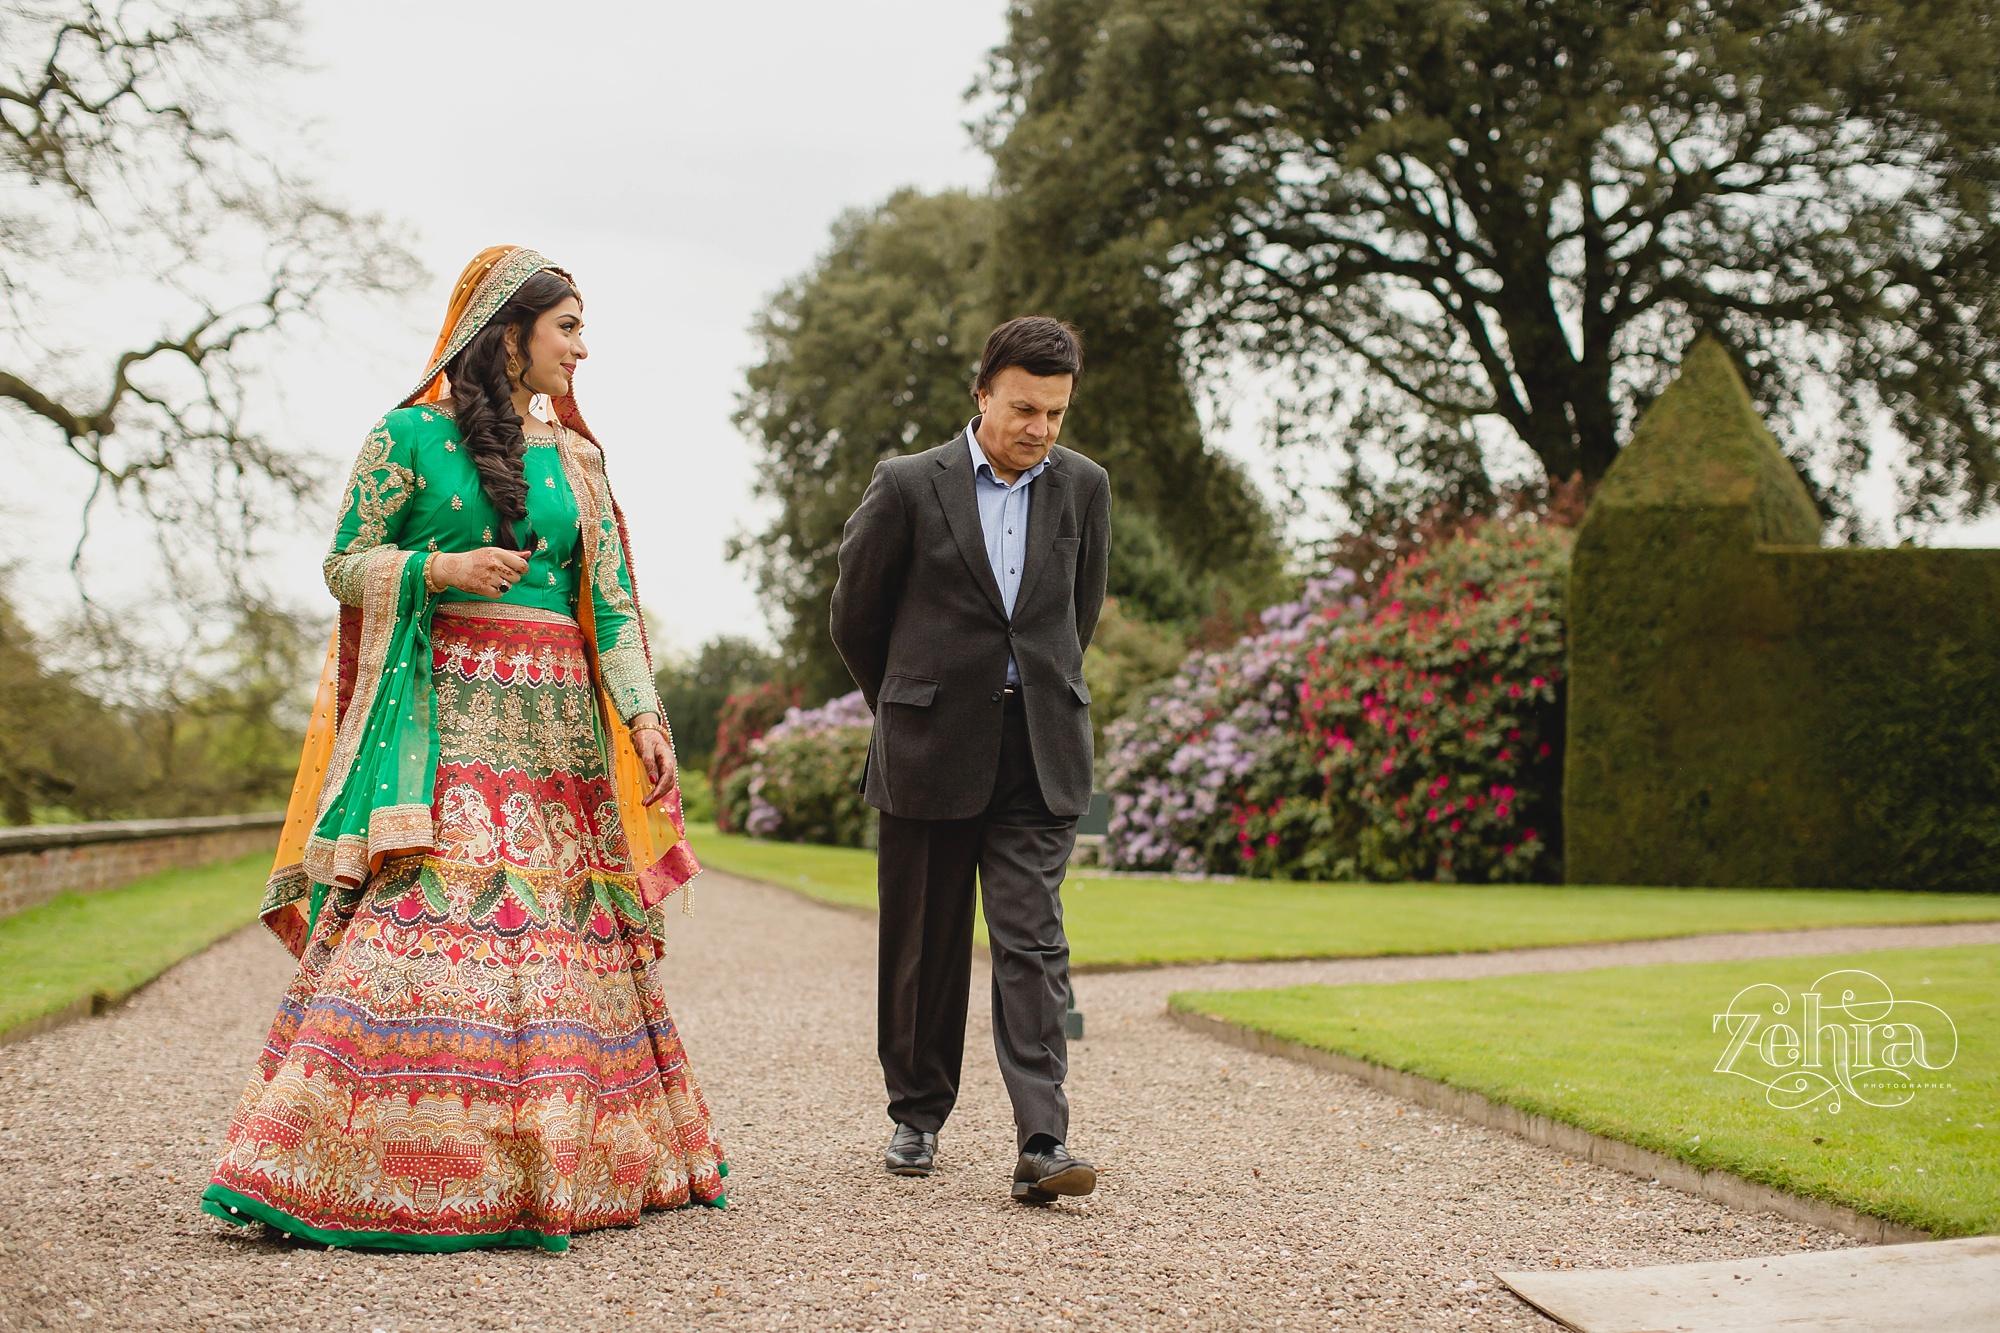 zehra wedding photographer arley hall cheshire020.jpg